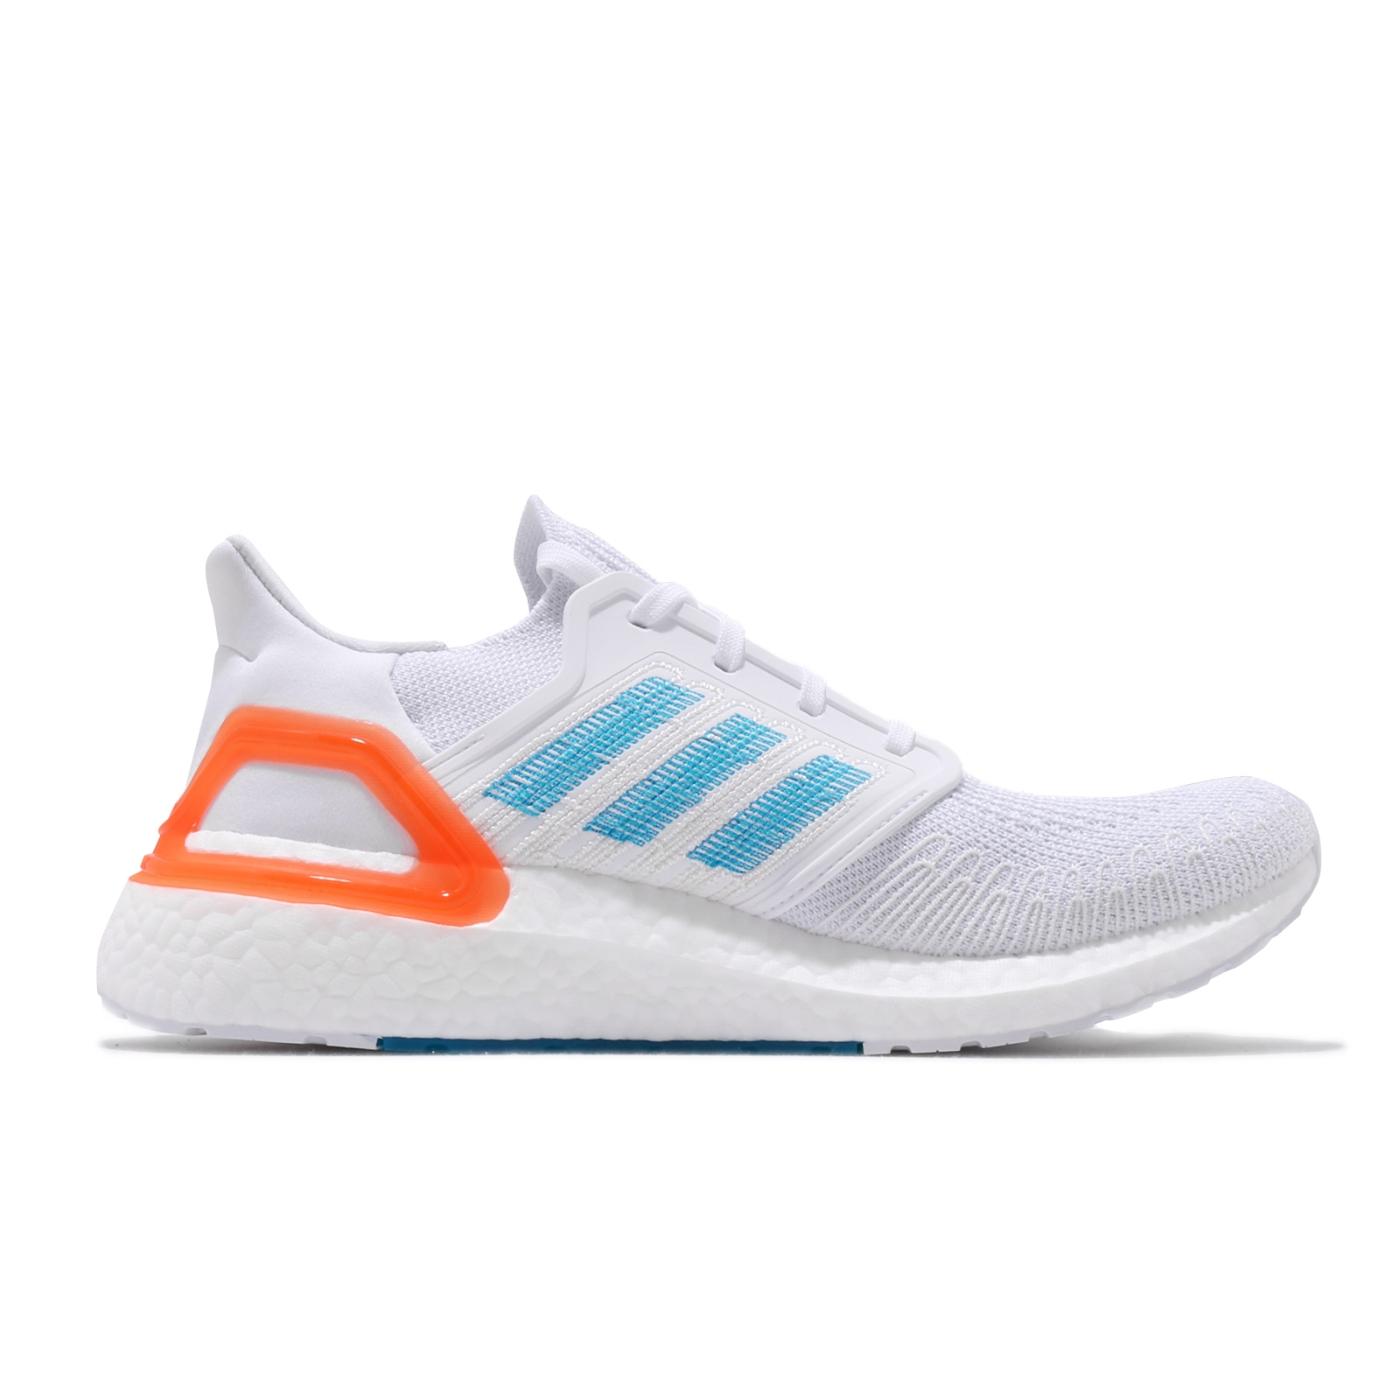 adidas 慢跑鞋 ULTRABOOST 20 襪套式 男鞋 愛迪達 運動休閒 緩震 輕量 穿搭 白 藍 橘 EG0768